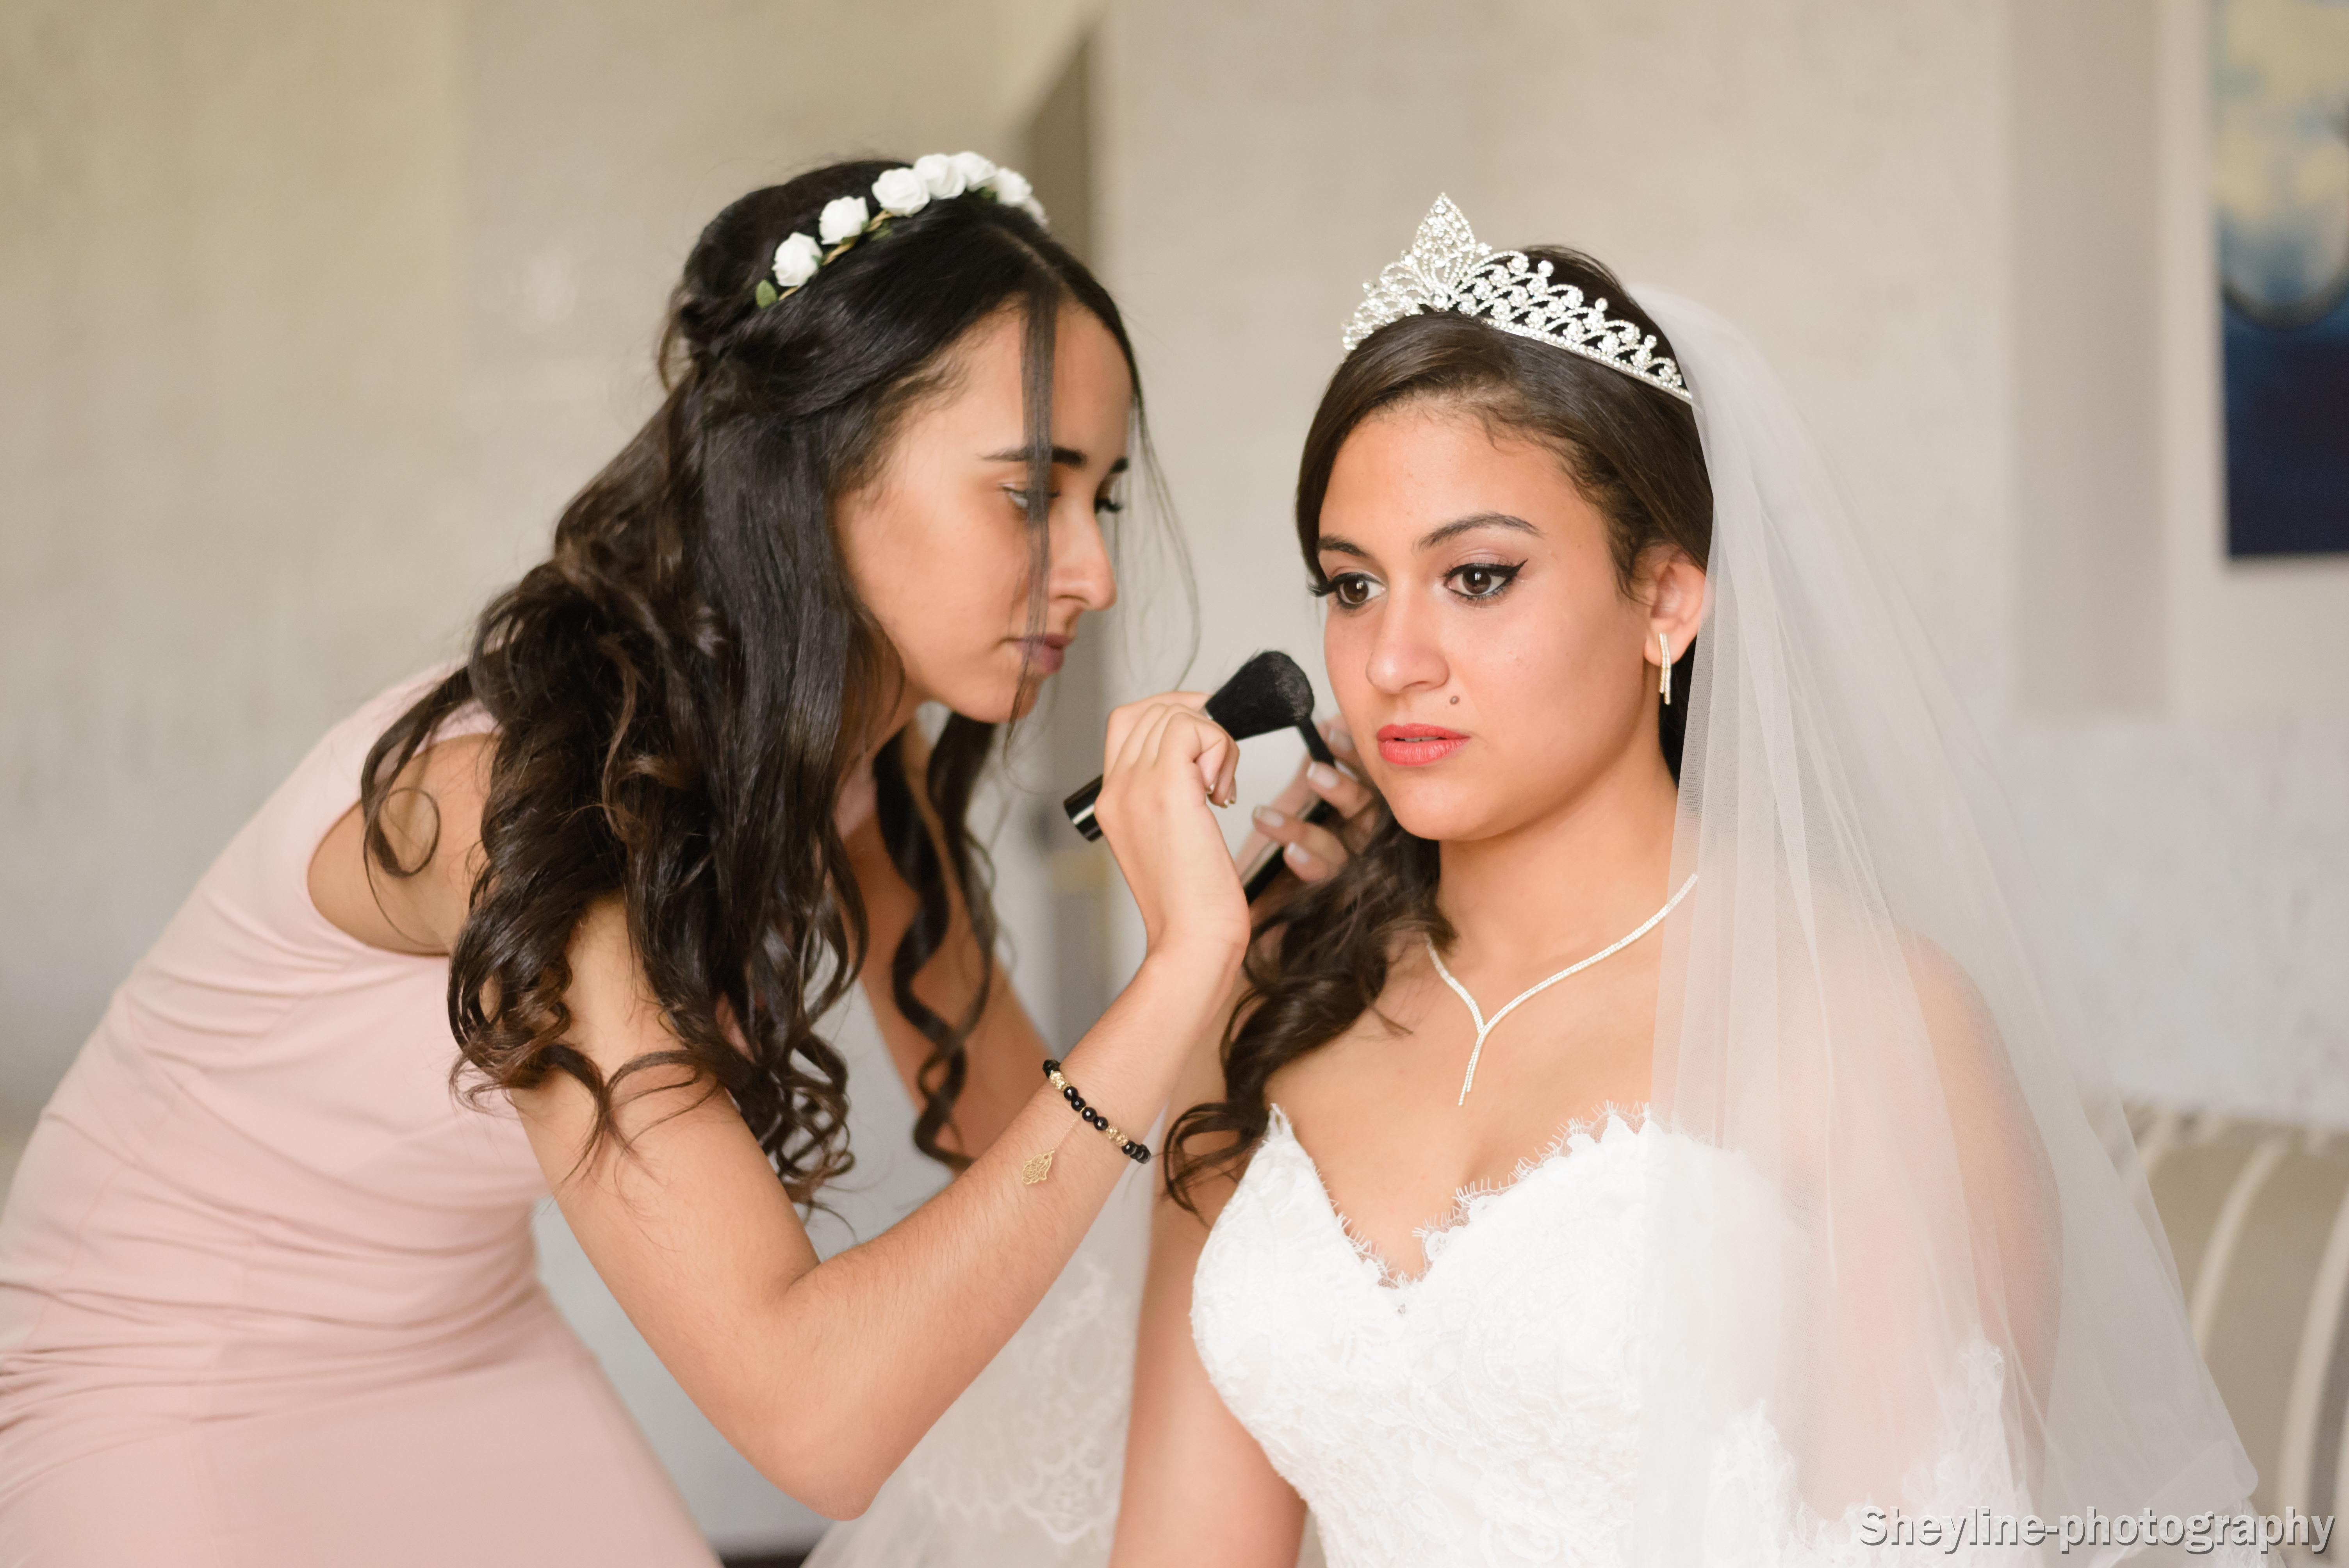 Photographe poitiers mariage 86 sheyline photography